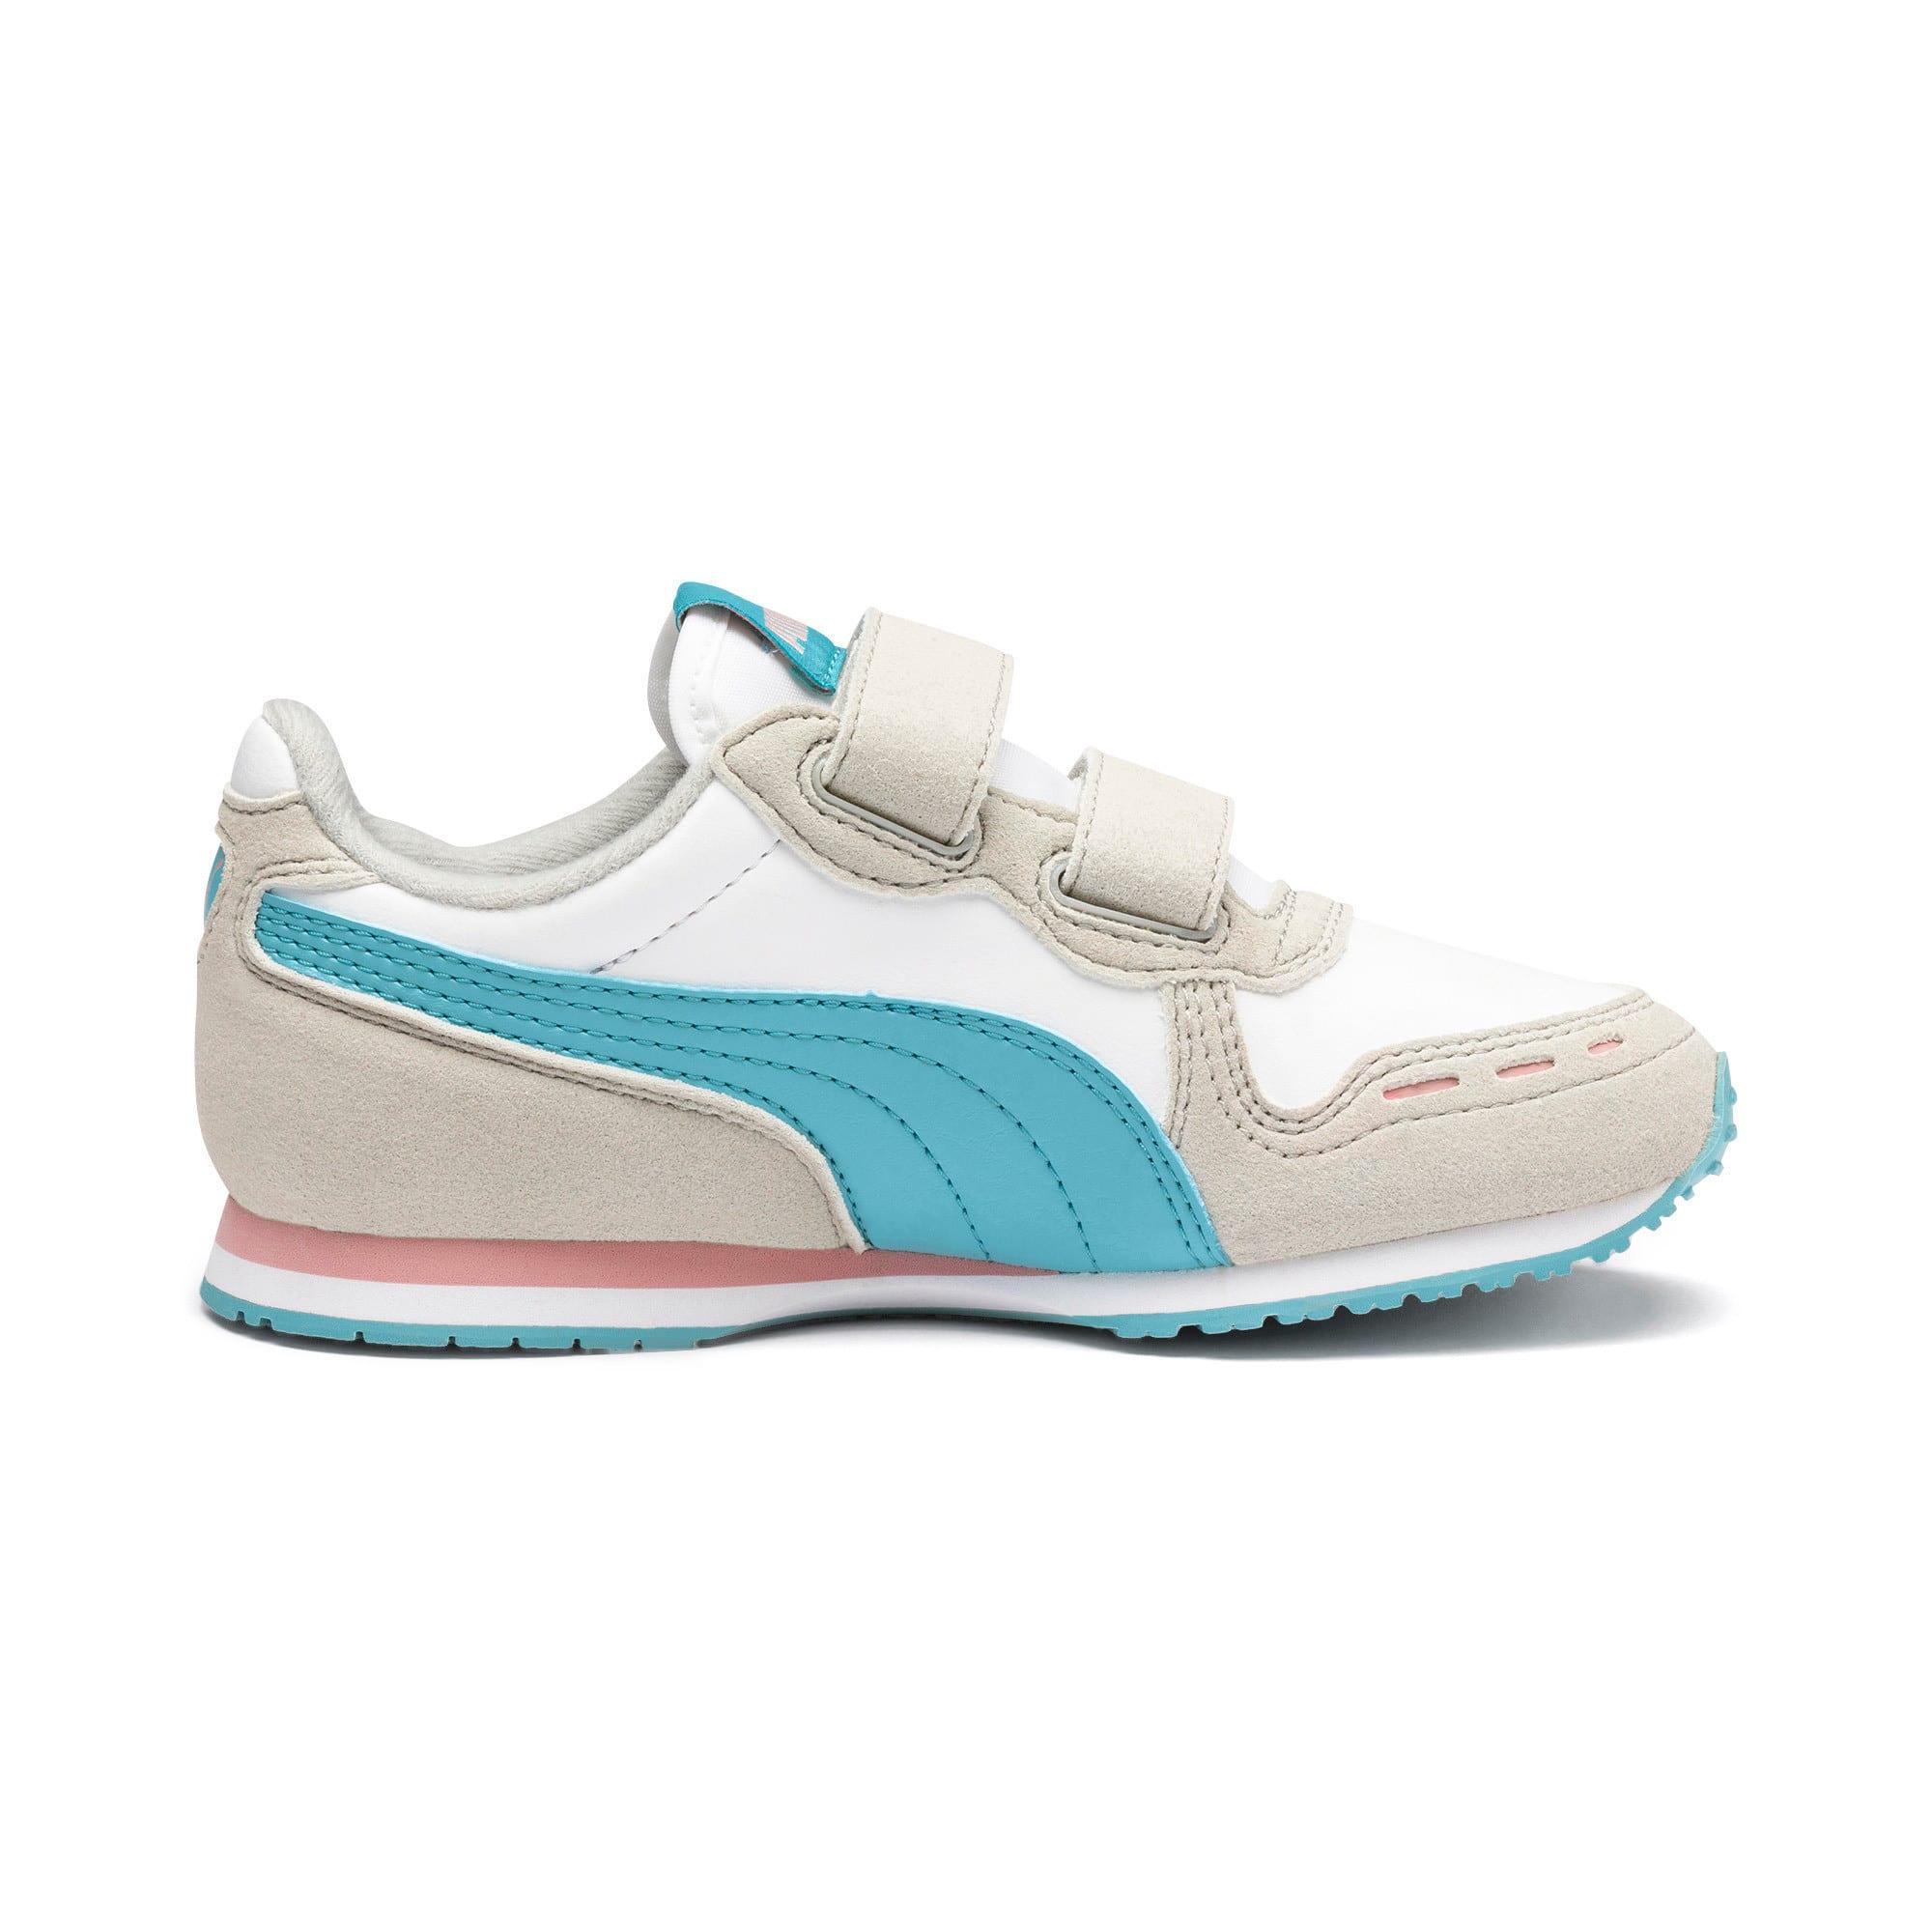 Thumbnail 5 of Cabana Racer SL V PS Baby Sneaker, Puma White-Milky Blue, medium